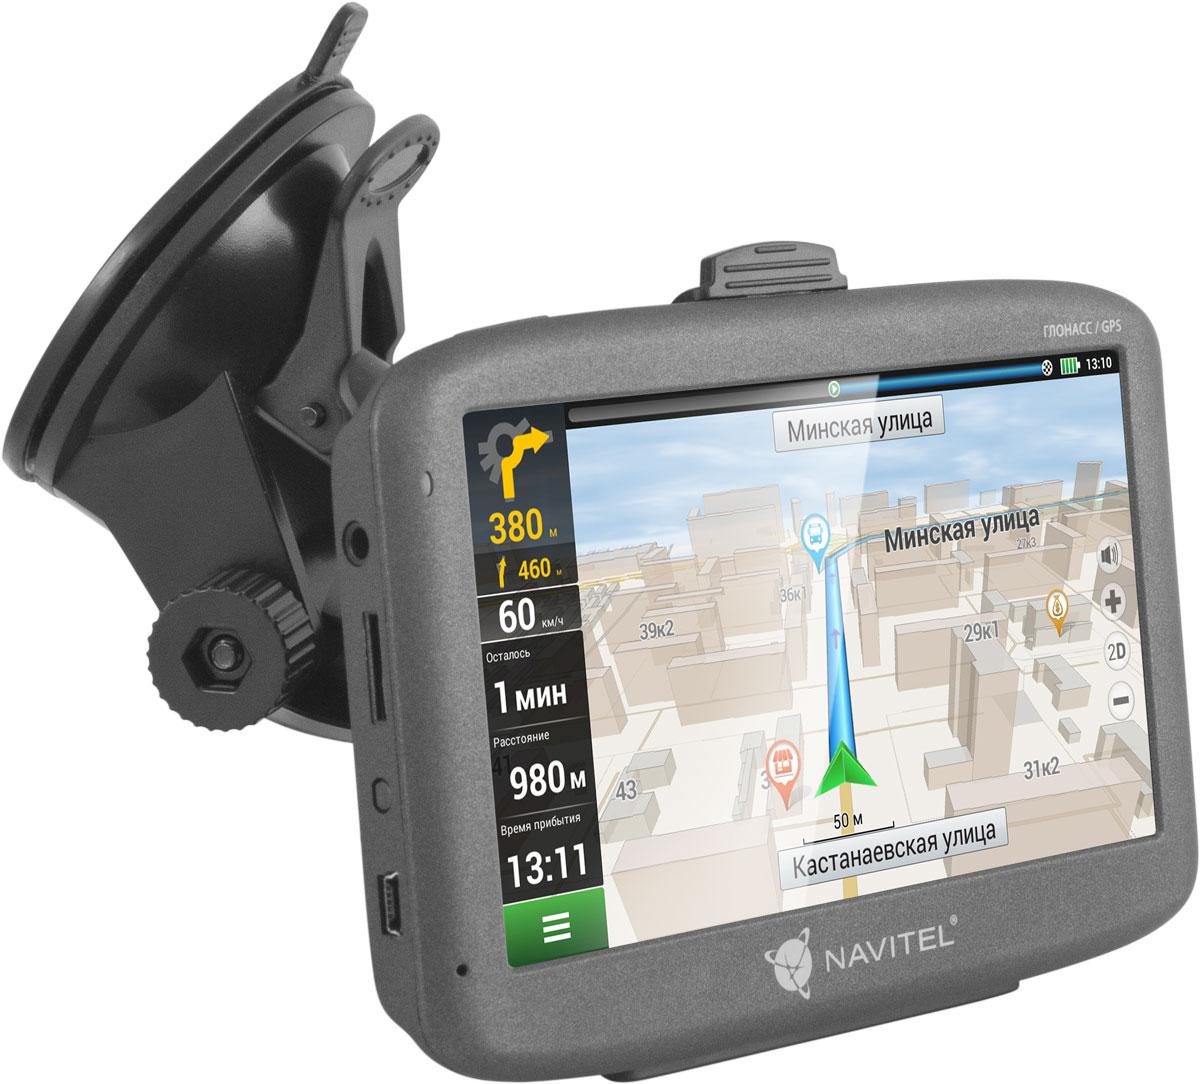 Navitel G500, Blackавтомобильный GPS навигатор Navitel